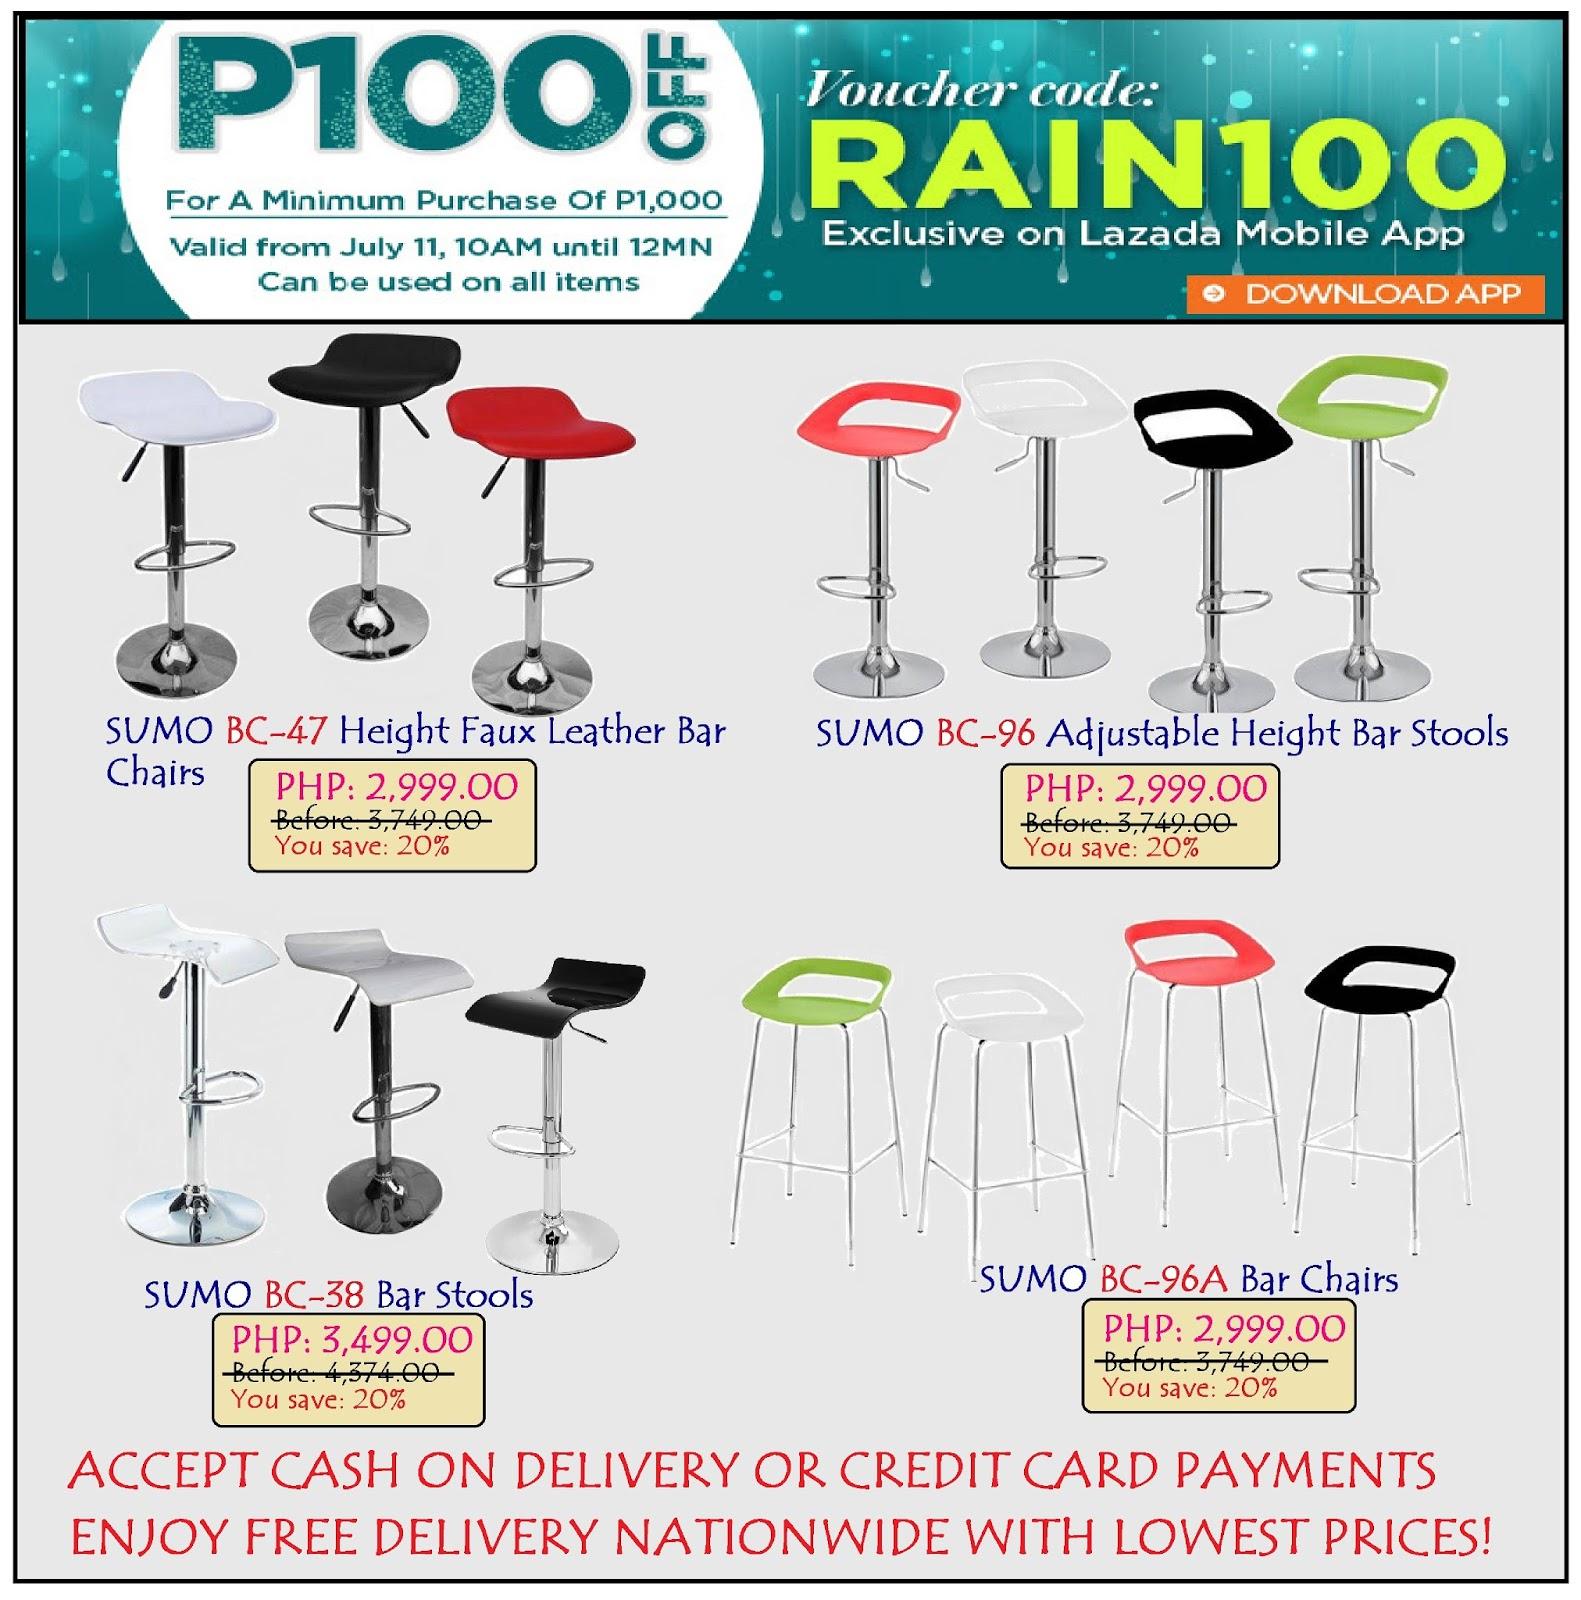 Cost U Less Office Furniture ManilaFurniture Supplier  : JULY2B11252C2B2015 100OFF2BSUMO2BBAR2BSTOOL2BBANNER from costuless.blogspot.com size 1581 x 1600 jpeg 404kB